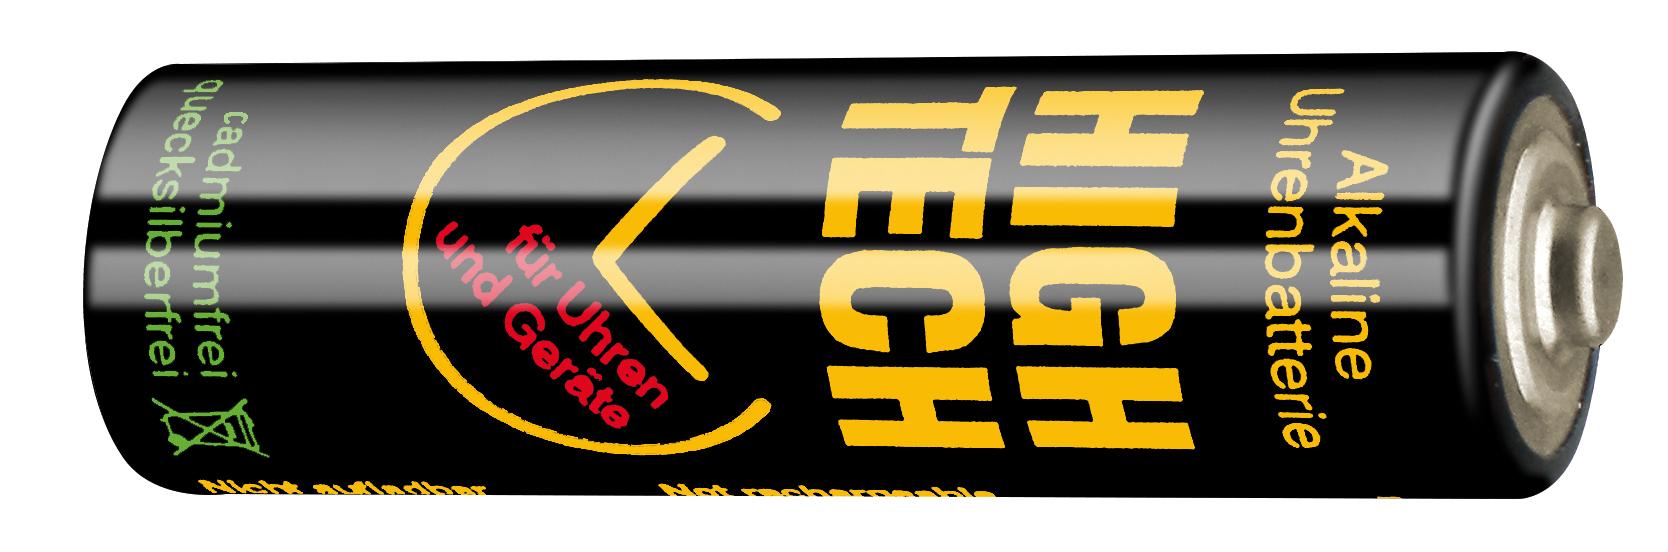 High Tech LR6 batterij